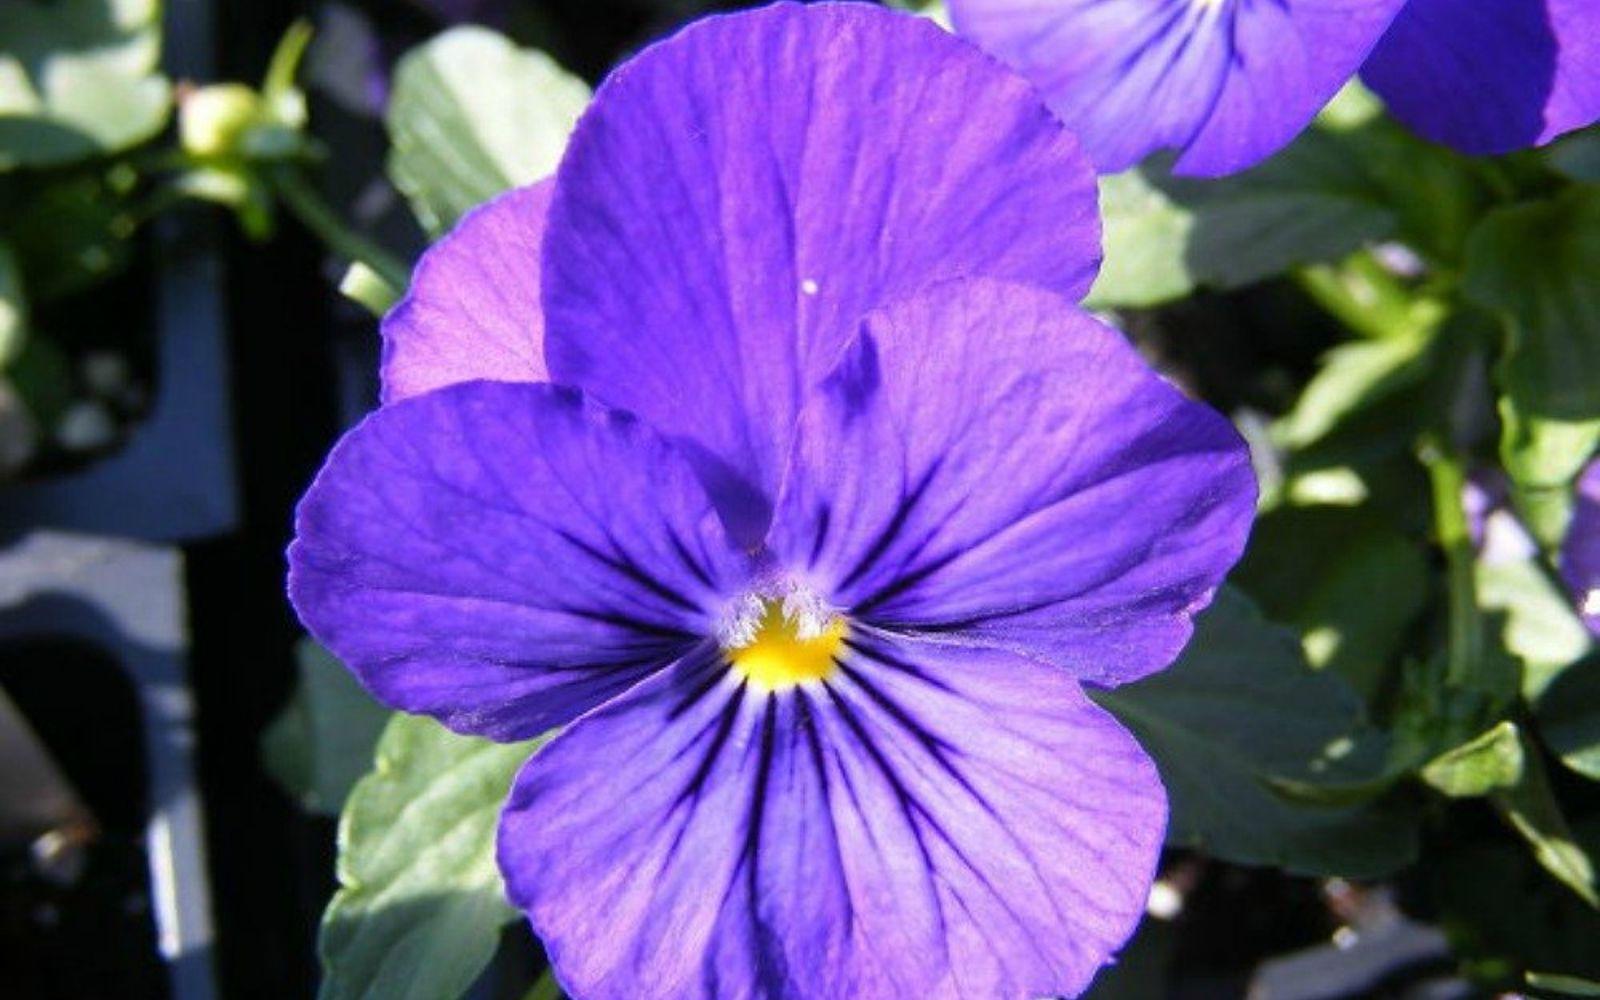 s the top 15 fall flowers everyone is loving this season, gardening, 5 Pansies